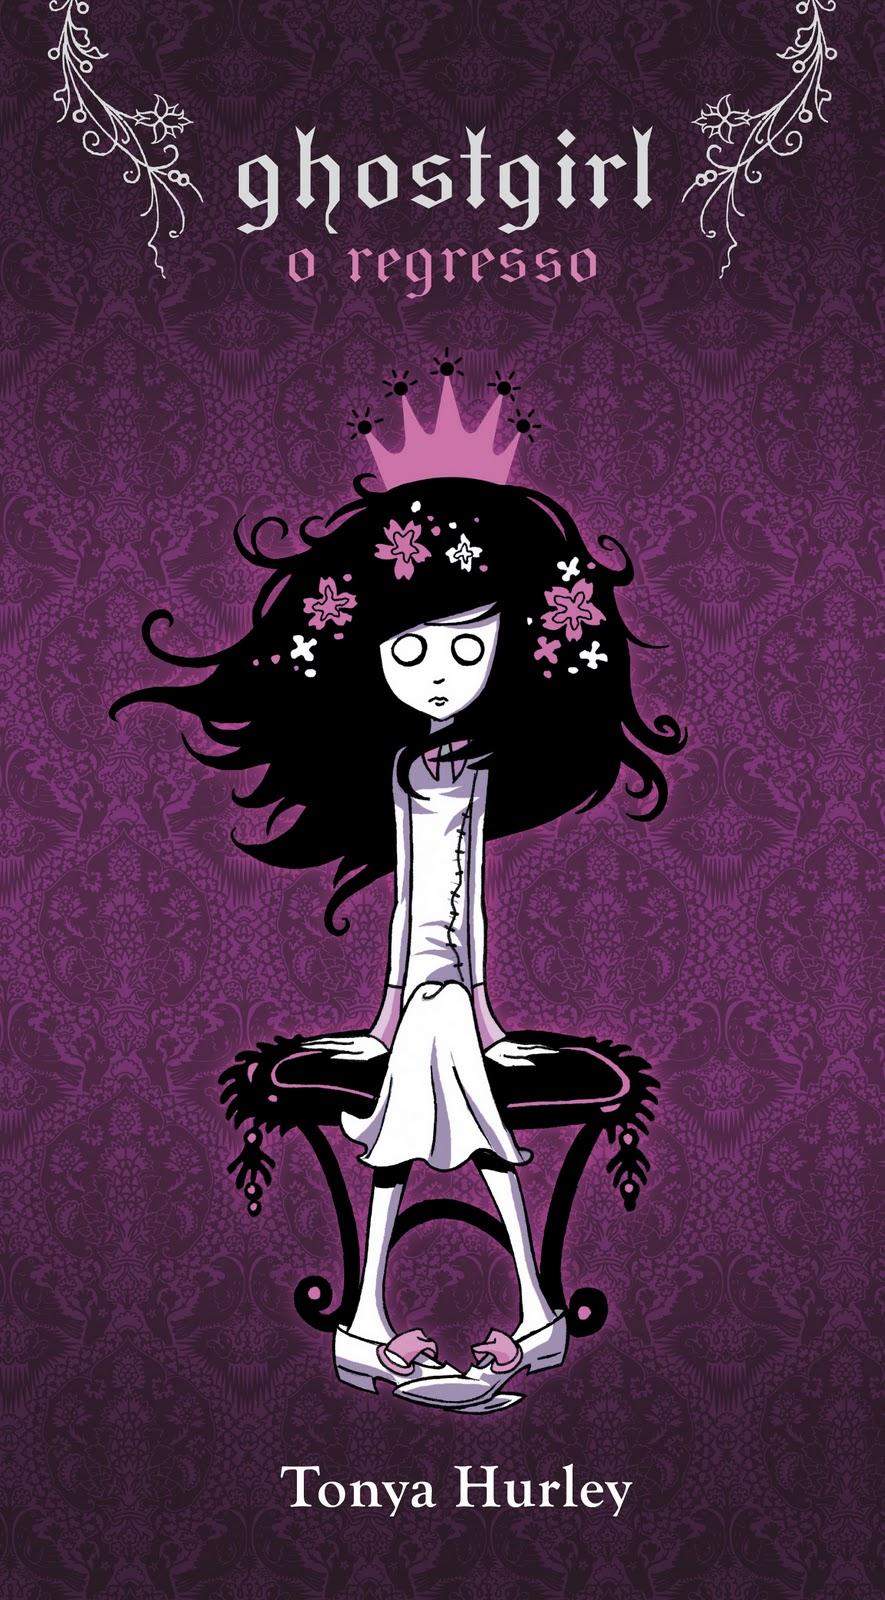 ghostgirl Portugal: Os Livros